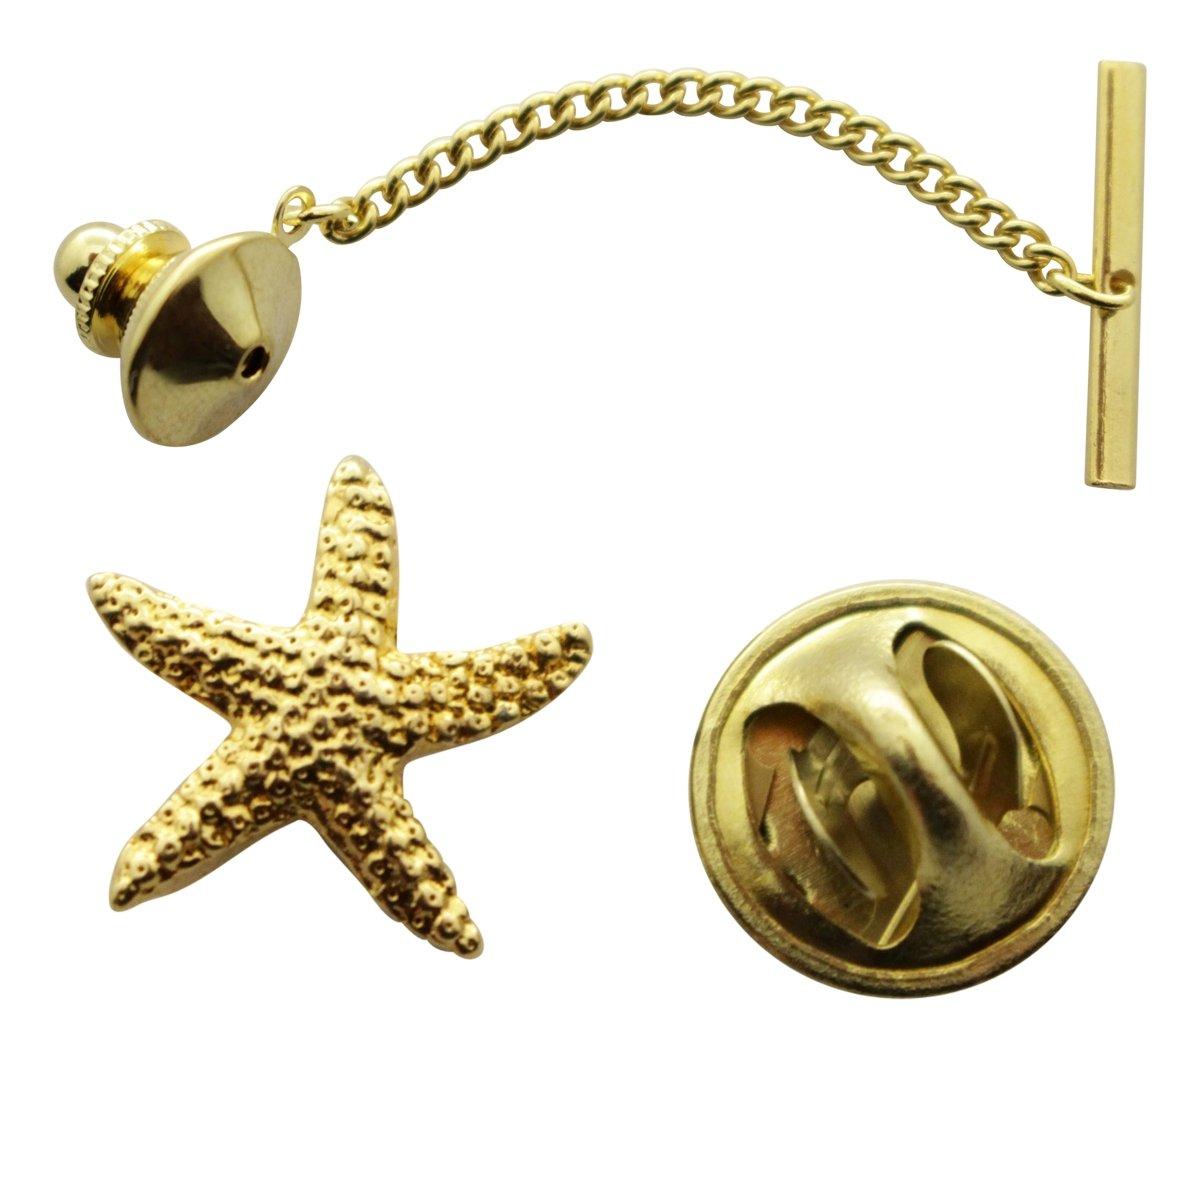 Starfish Tie Tack ~ 24K Gold ~ Tie Tack or Pin ~ Sarah's Treats & Treasures